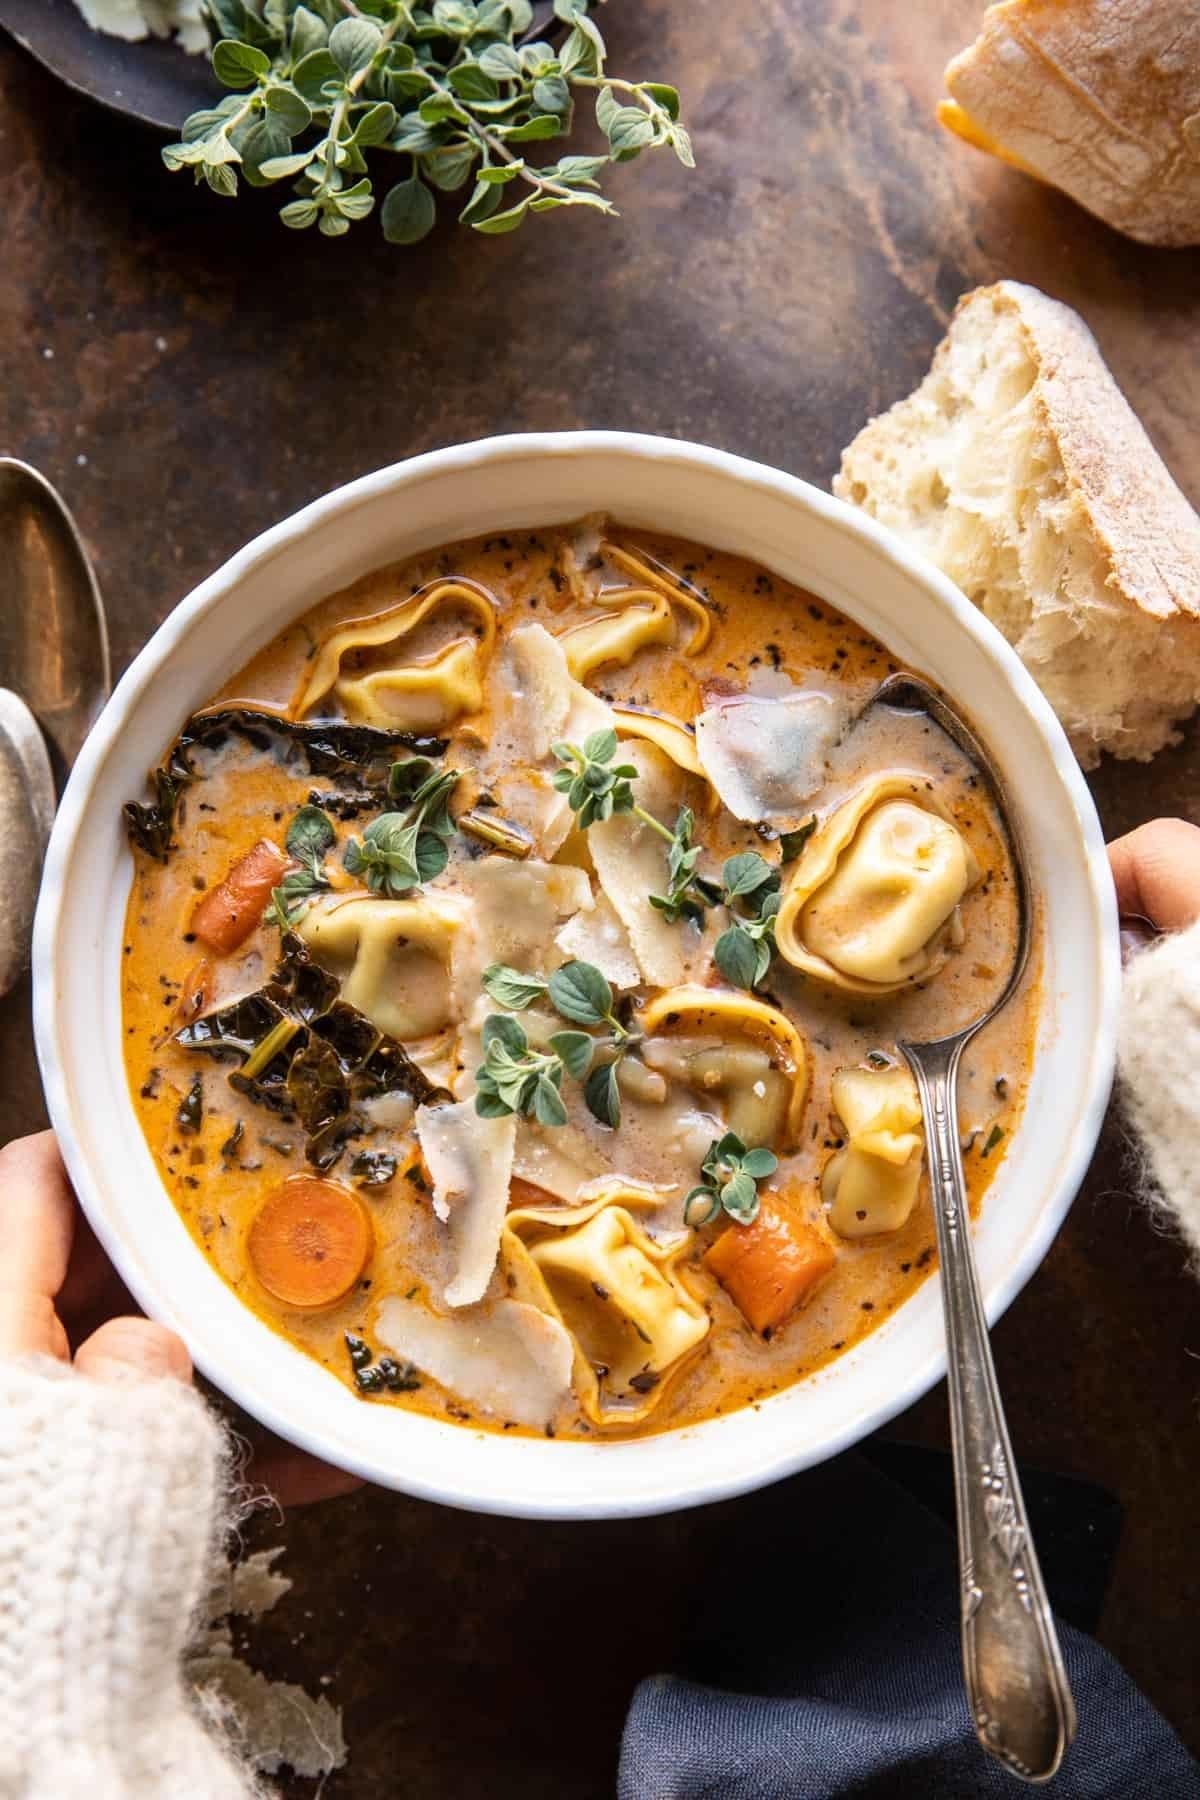 Tortellini vegetable soup